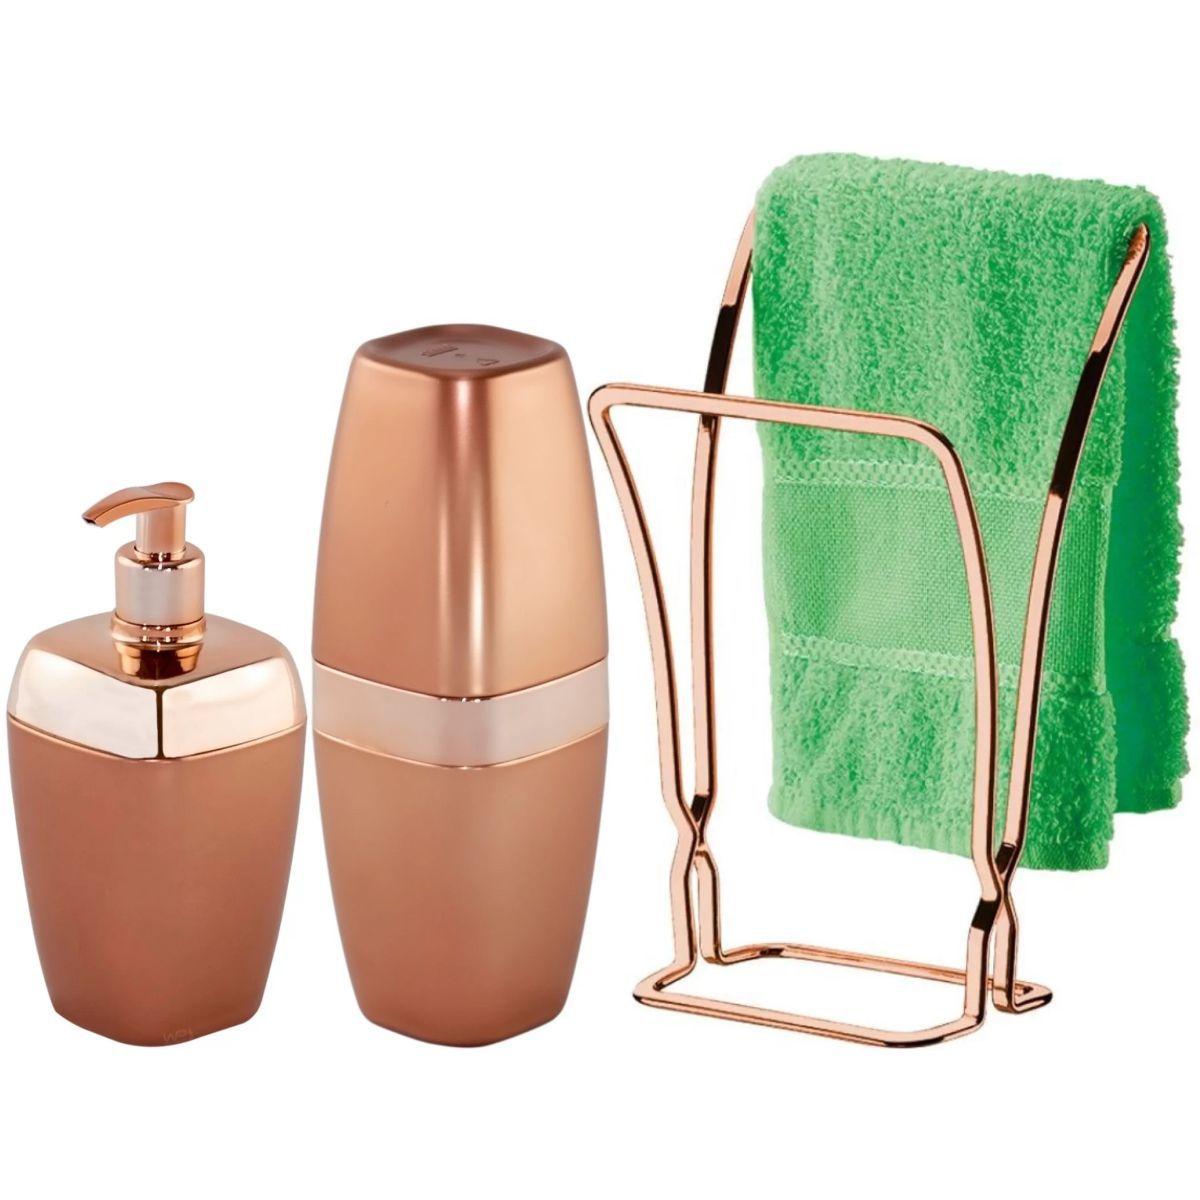 Kit Acessórios Para Banheiro 3 Peças Luxo Wp Connect